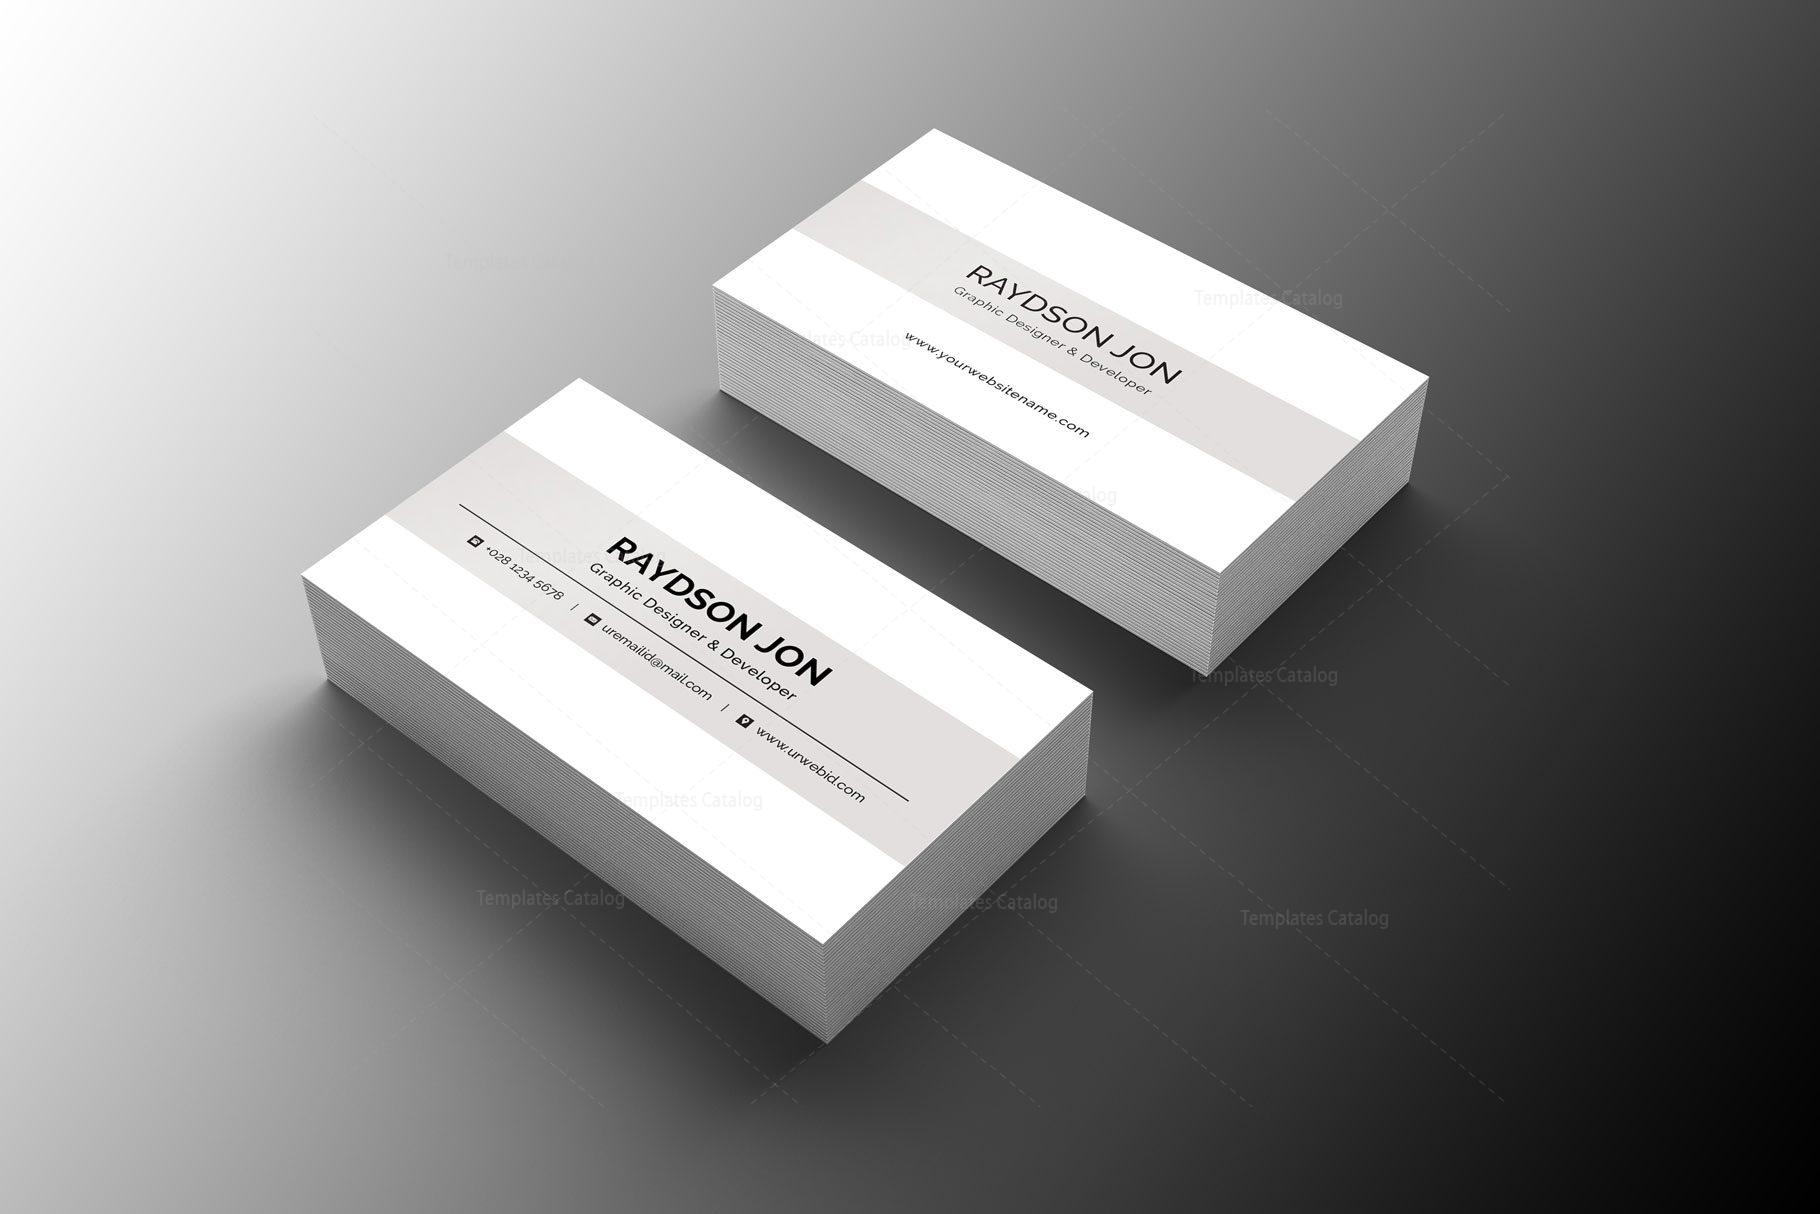 Minimal retail business card design 002244 template catalog minimal retail business card design 1 colourmoves